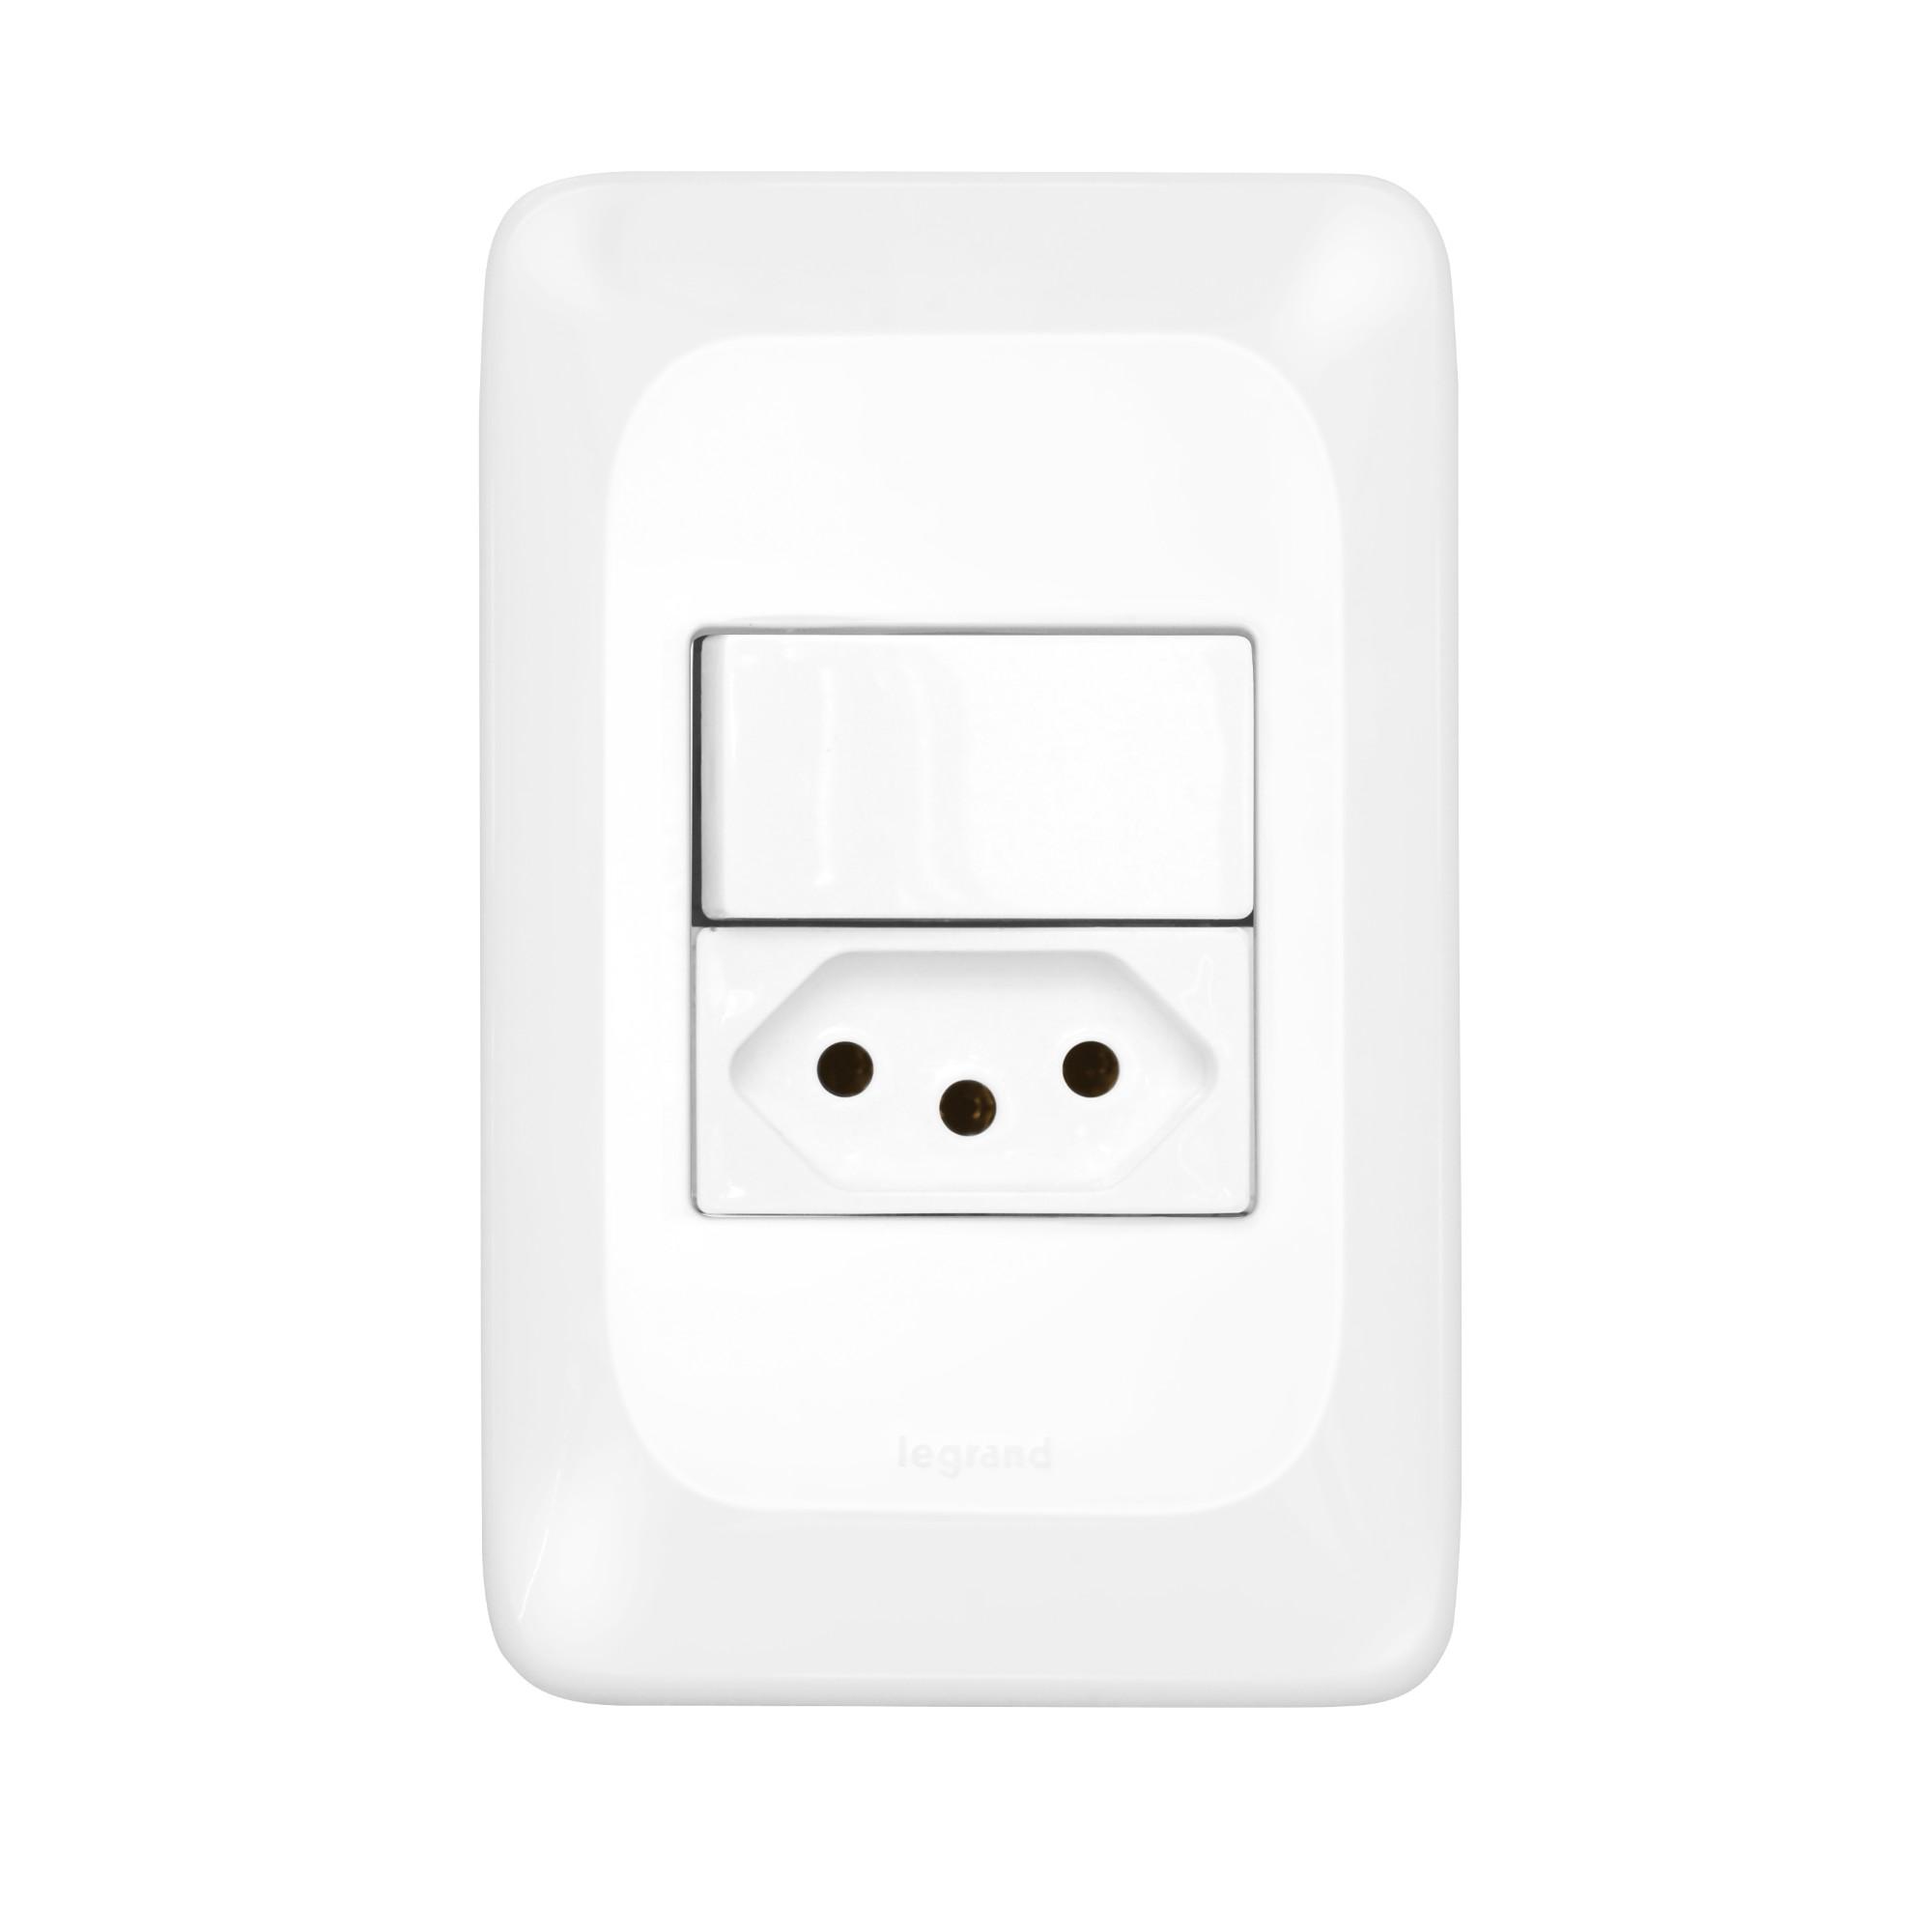 Conjunto 1 Interruptor Simples 1 Tomada 10A 2PT Linha POP 4x2 Branco - Legrand